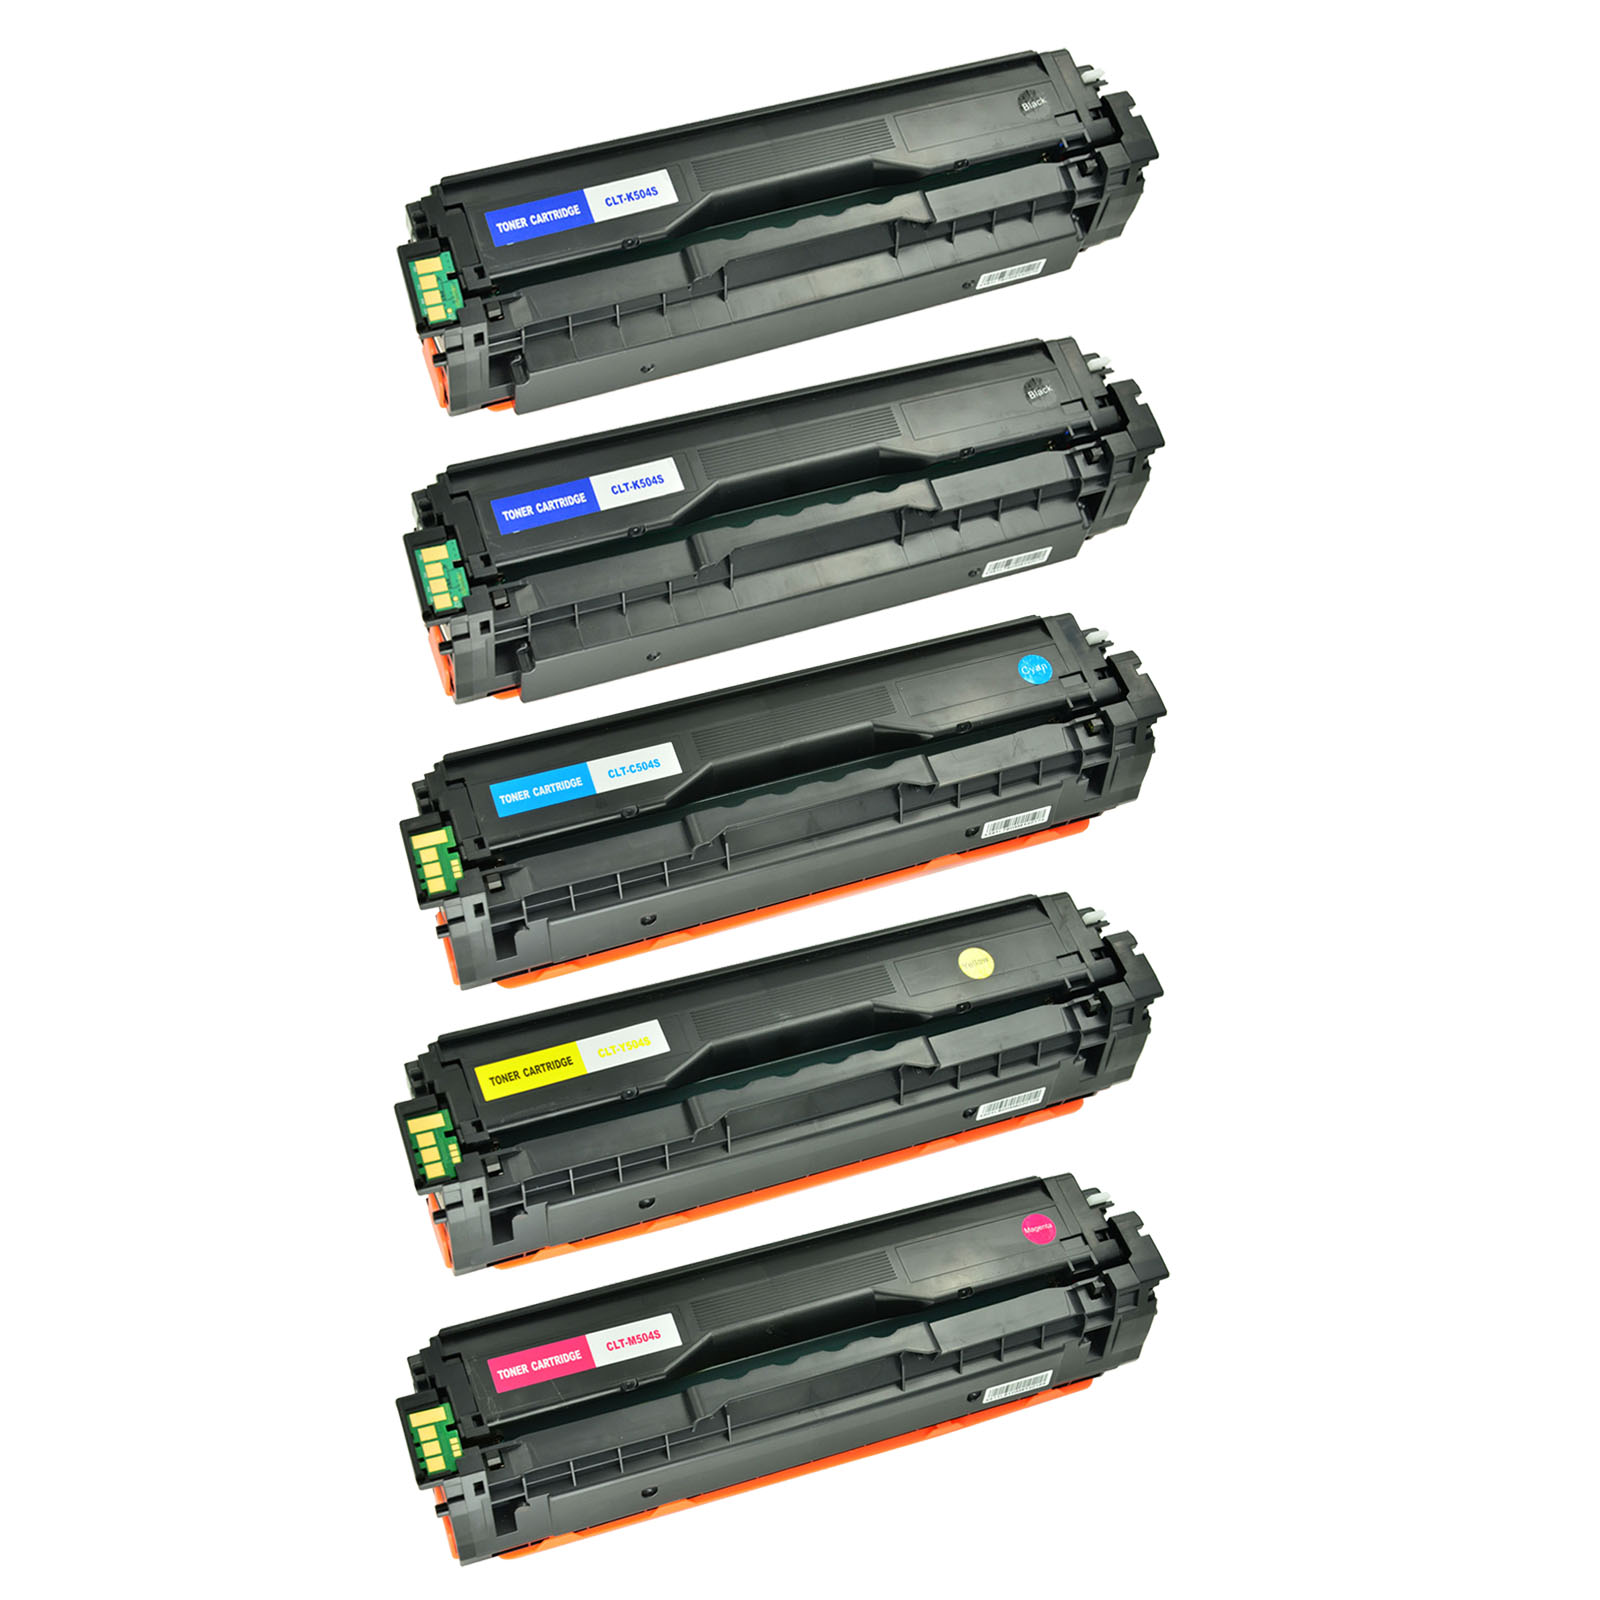 CLT-504S BCMY Toner Cartridges for Samsung SL-C1860FW CLX-4195FW CLP-415NW 475